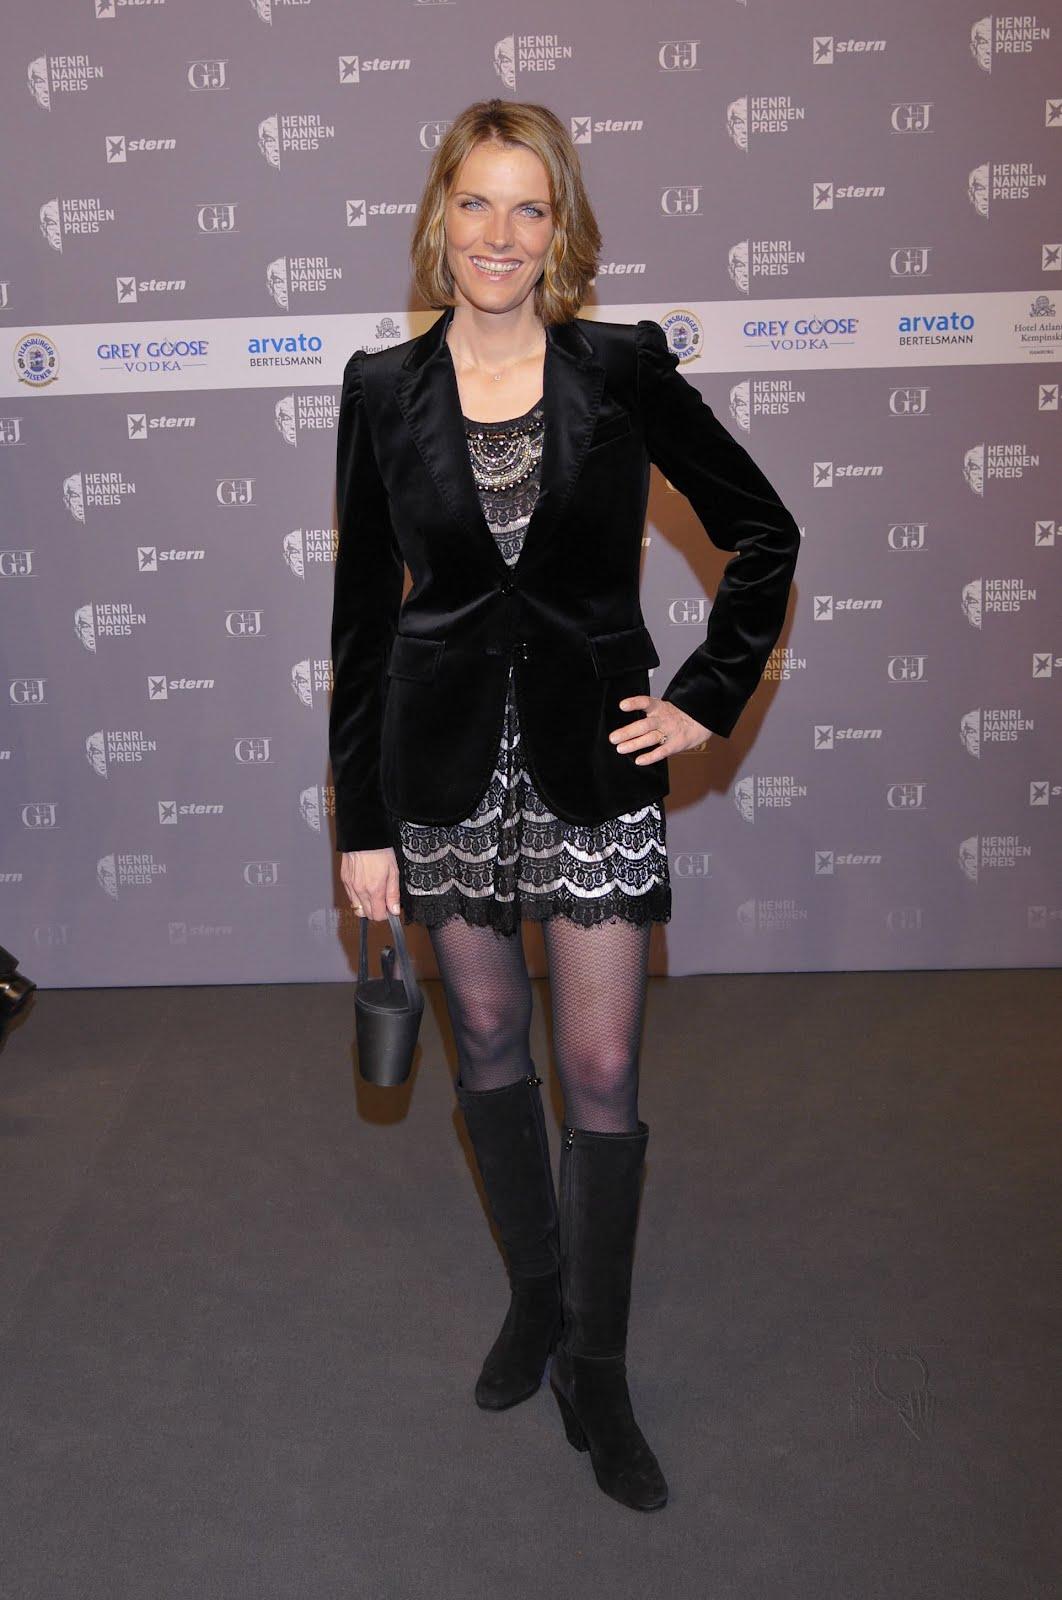 Marietta Slomka: Wahlkampf bisher eher langweilig | Politik